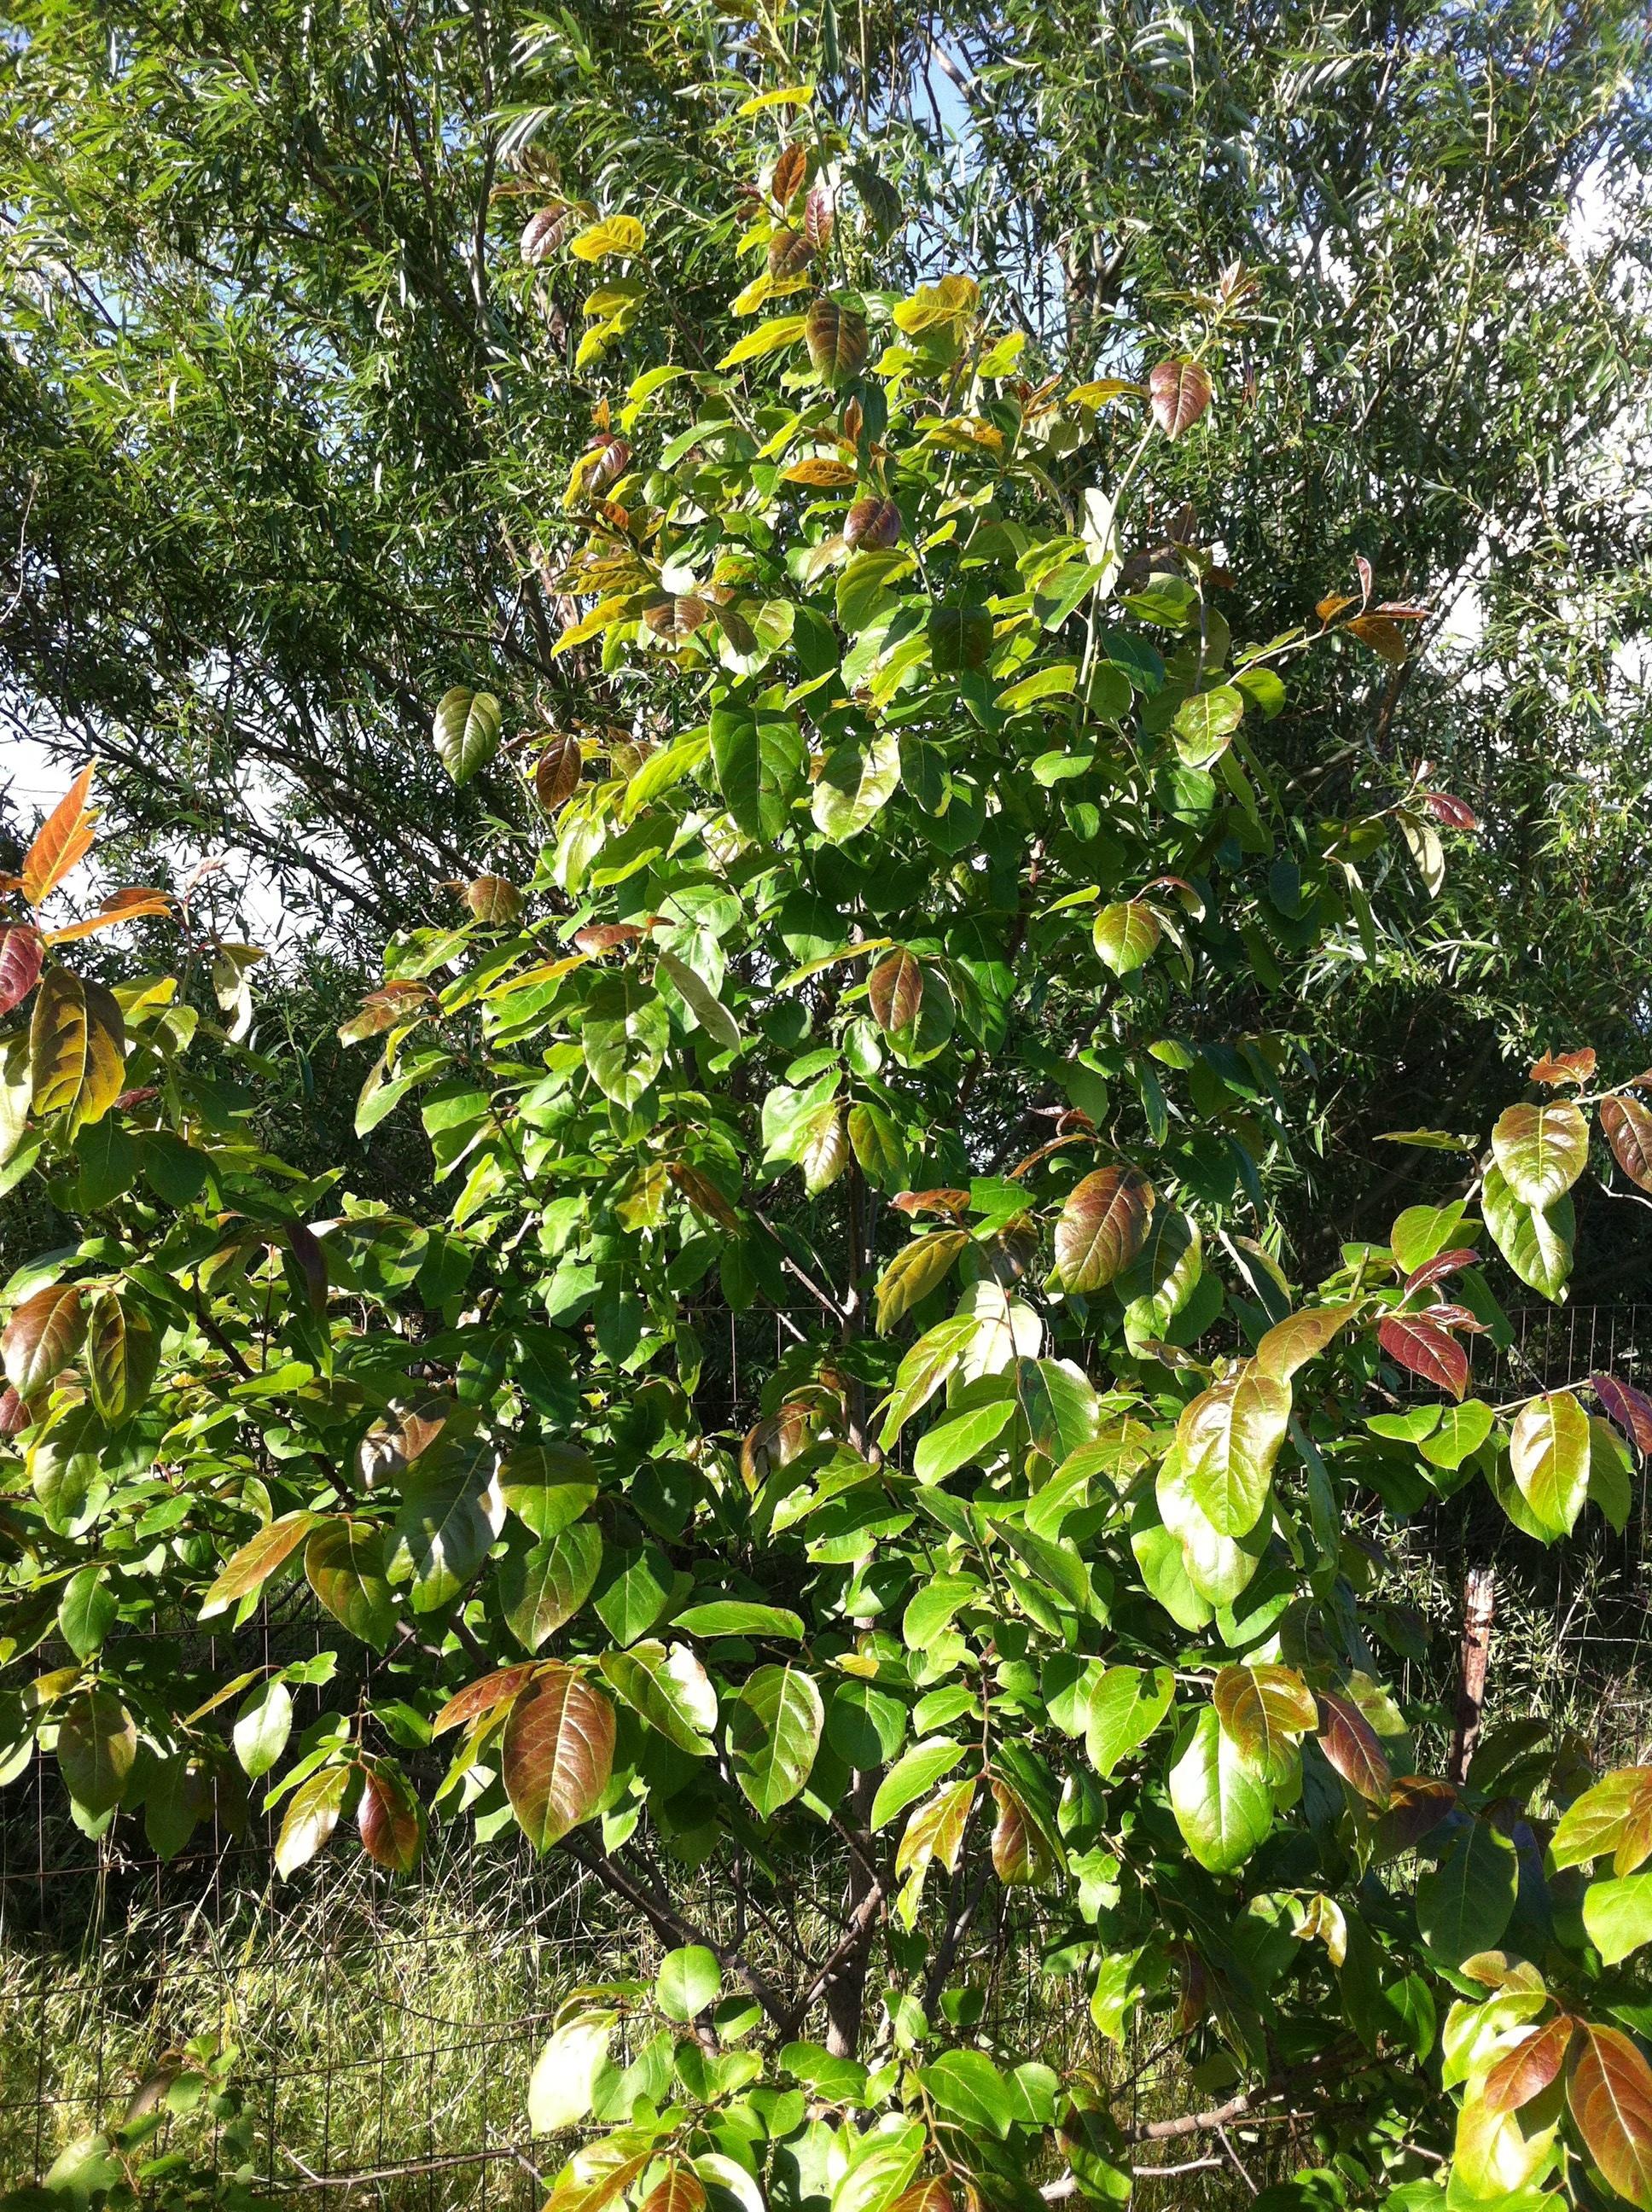 Lotus persimmon buds general fruit growing growing fruit imageg1936x2592 235 mb izmirmasajfo